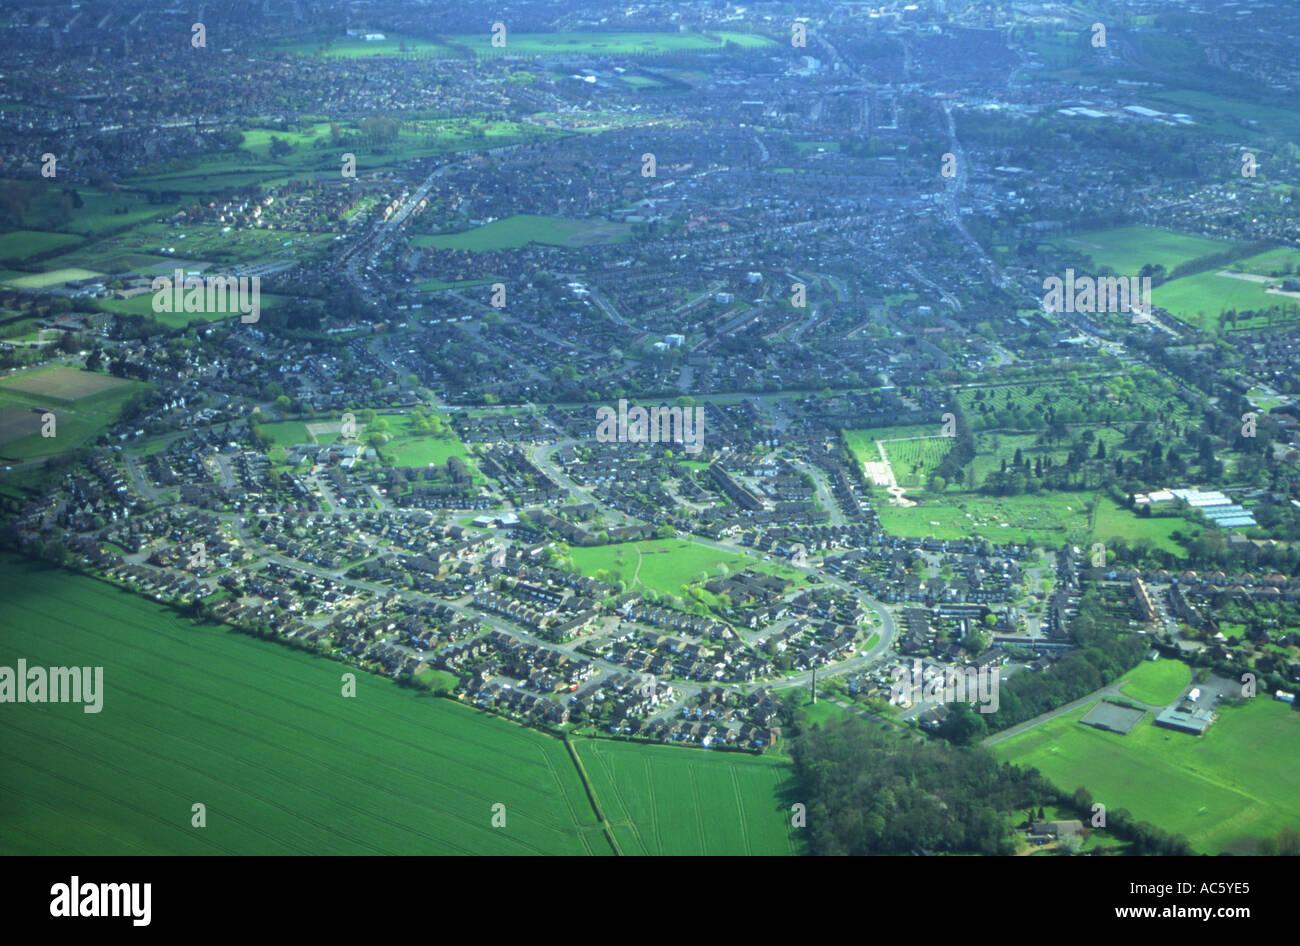 Suburbia at the edge of Northampton - Stock Image